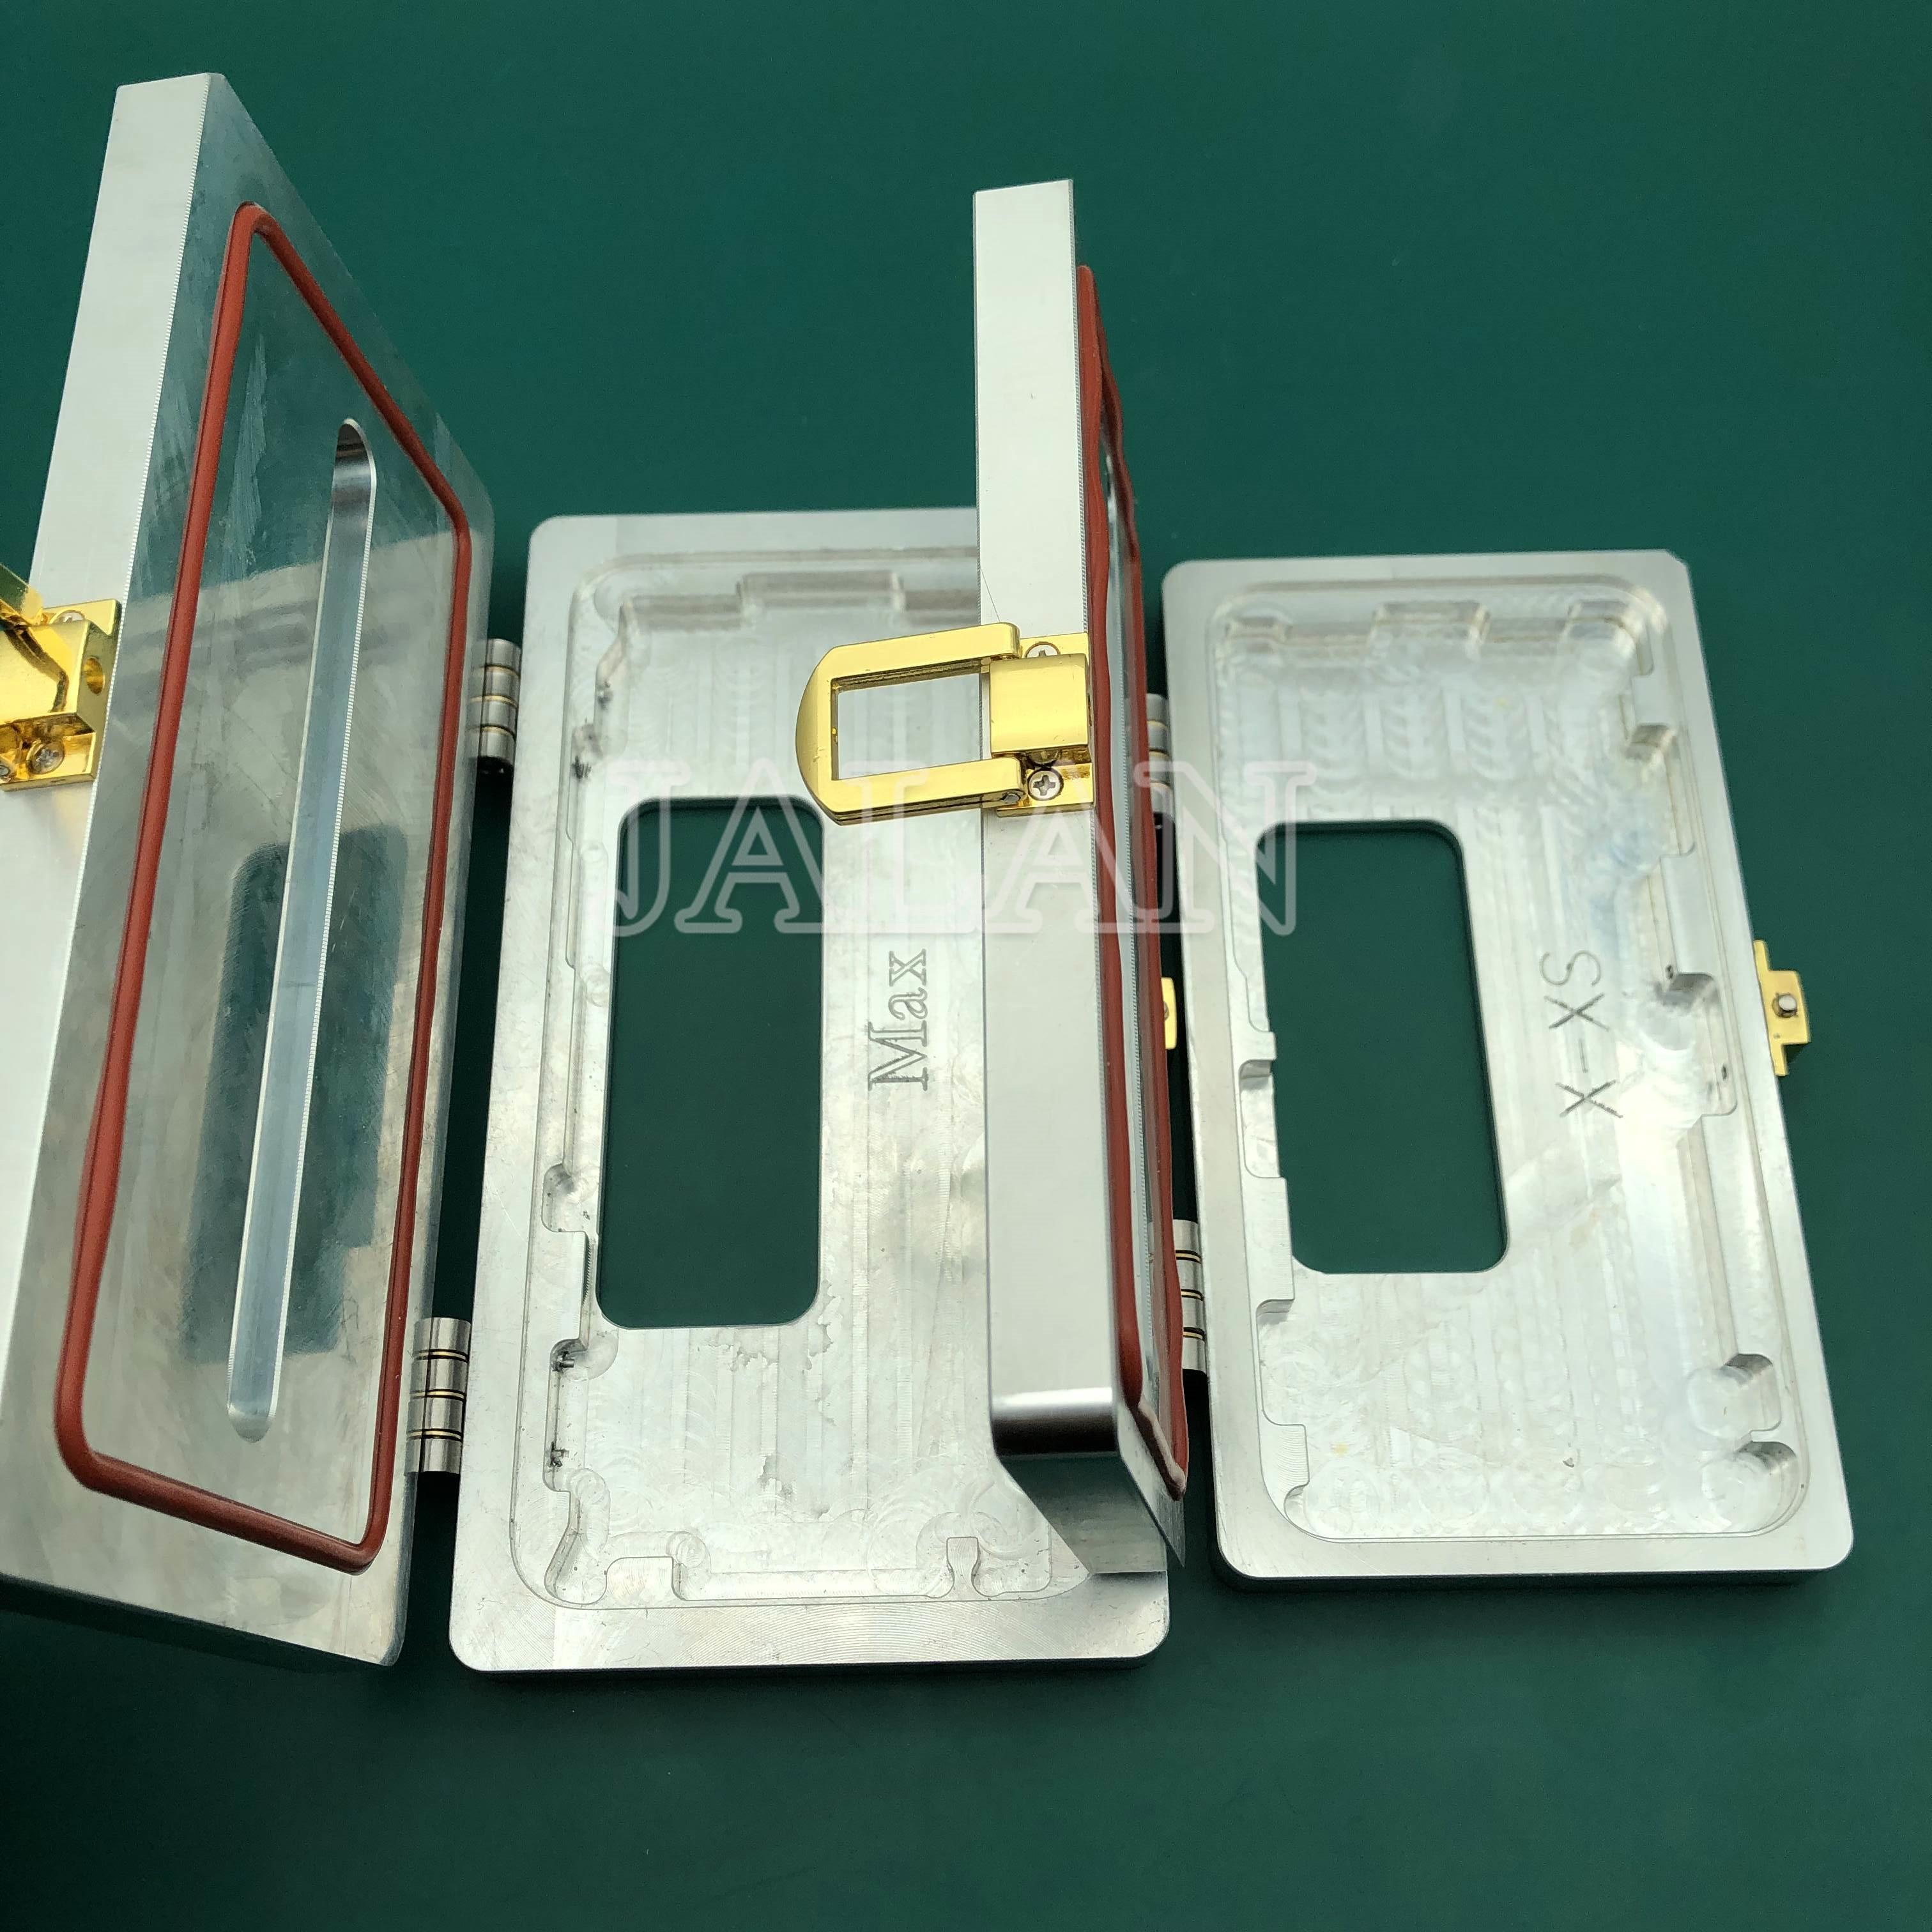 Molde de sujeción JALAN para iPhone XS MAX 5,8/6,5, Marco biselado, molde de laminación, marco de cristal LCD, laminación, pegamento, dispensación, molde de sujeción